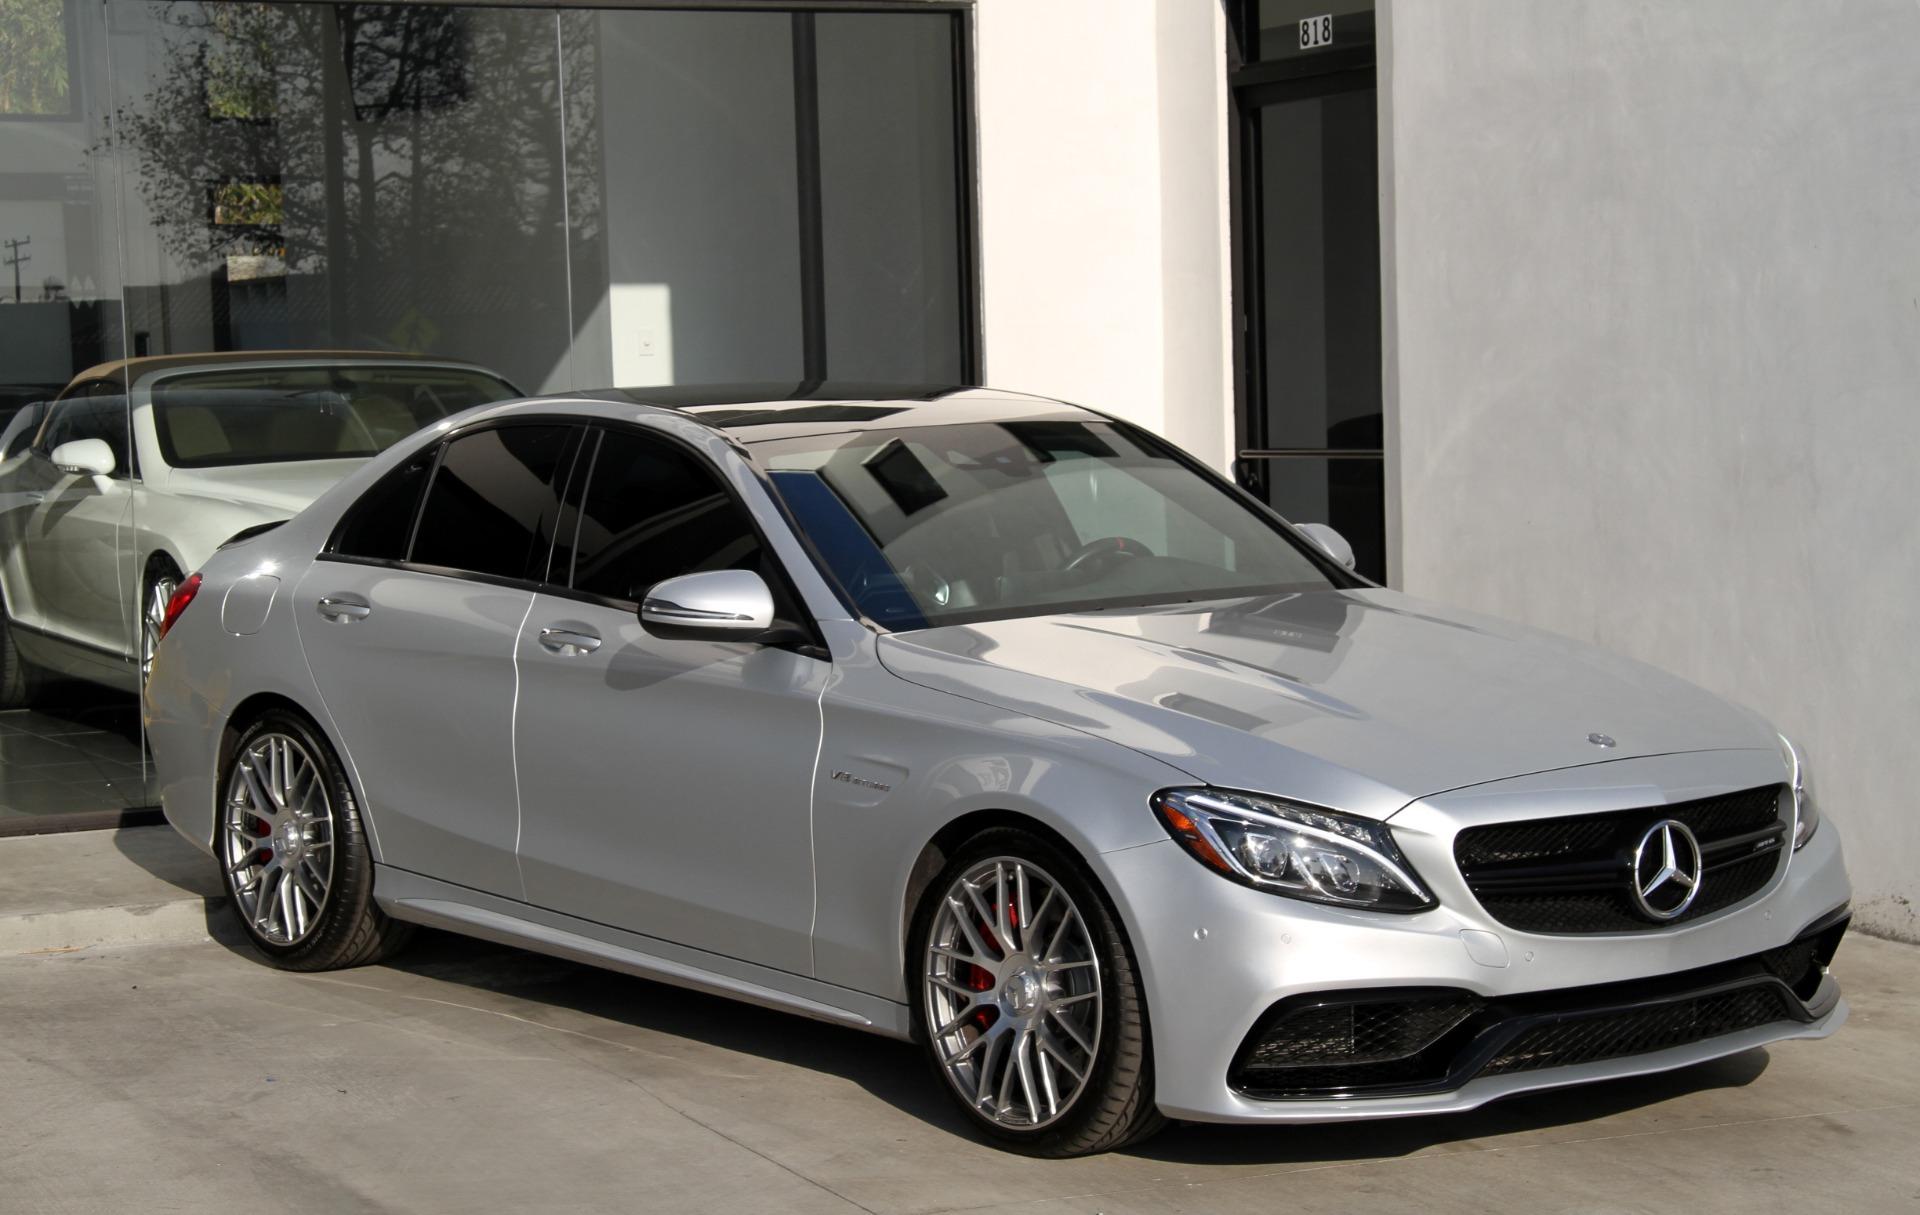 Mercedes Dealership Near Me >> 2016 Mercedes-Benz C63 S AMG Stock # 6004 for sale near Redondo Beach, CA   CA Mercedes-Benz Dealer